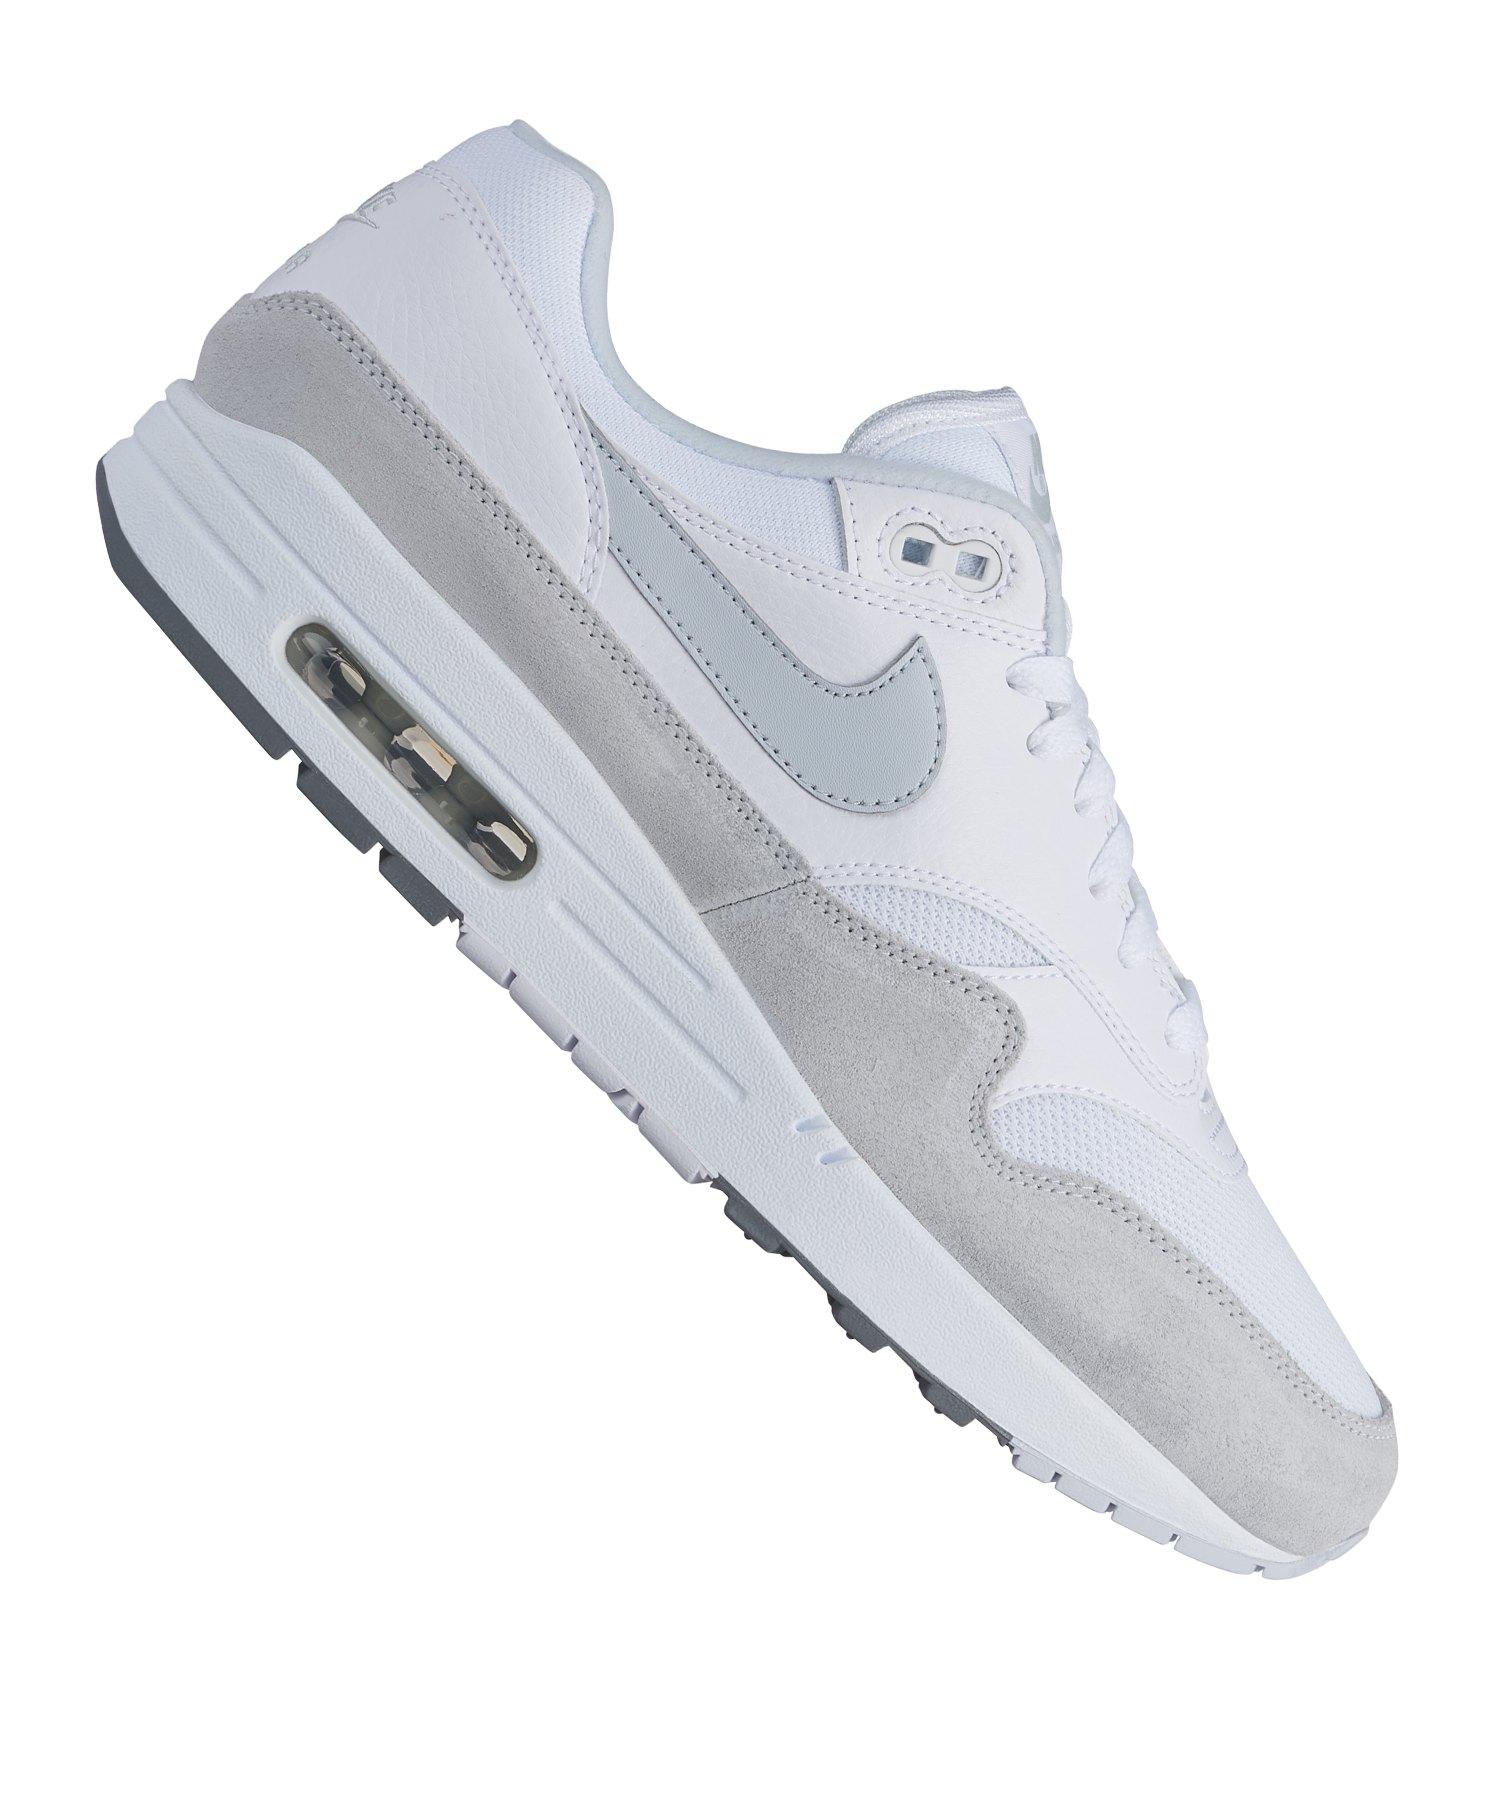 b3122665afdc6 nike schuhe herren wei       sneaker Nike Air Max 1 Sneaker